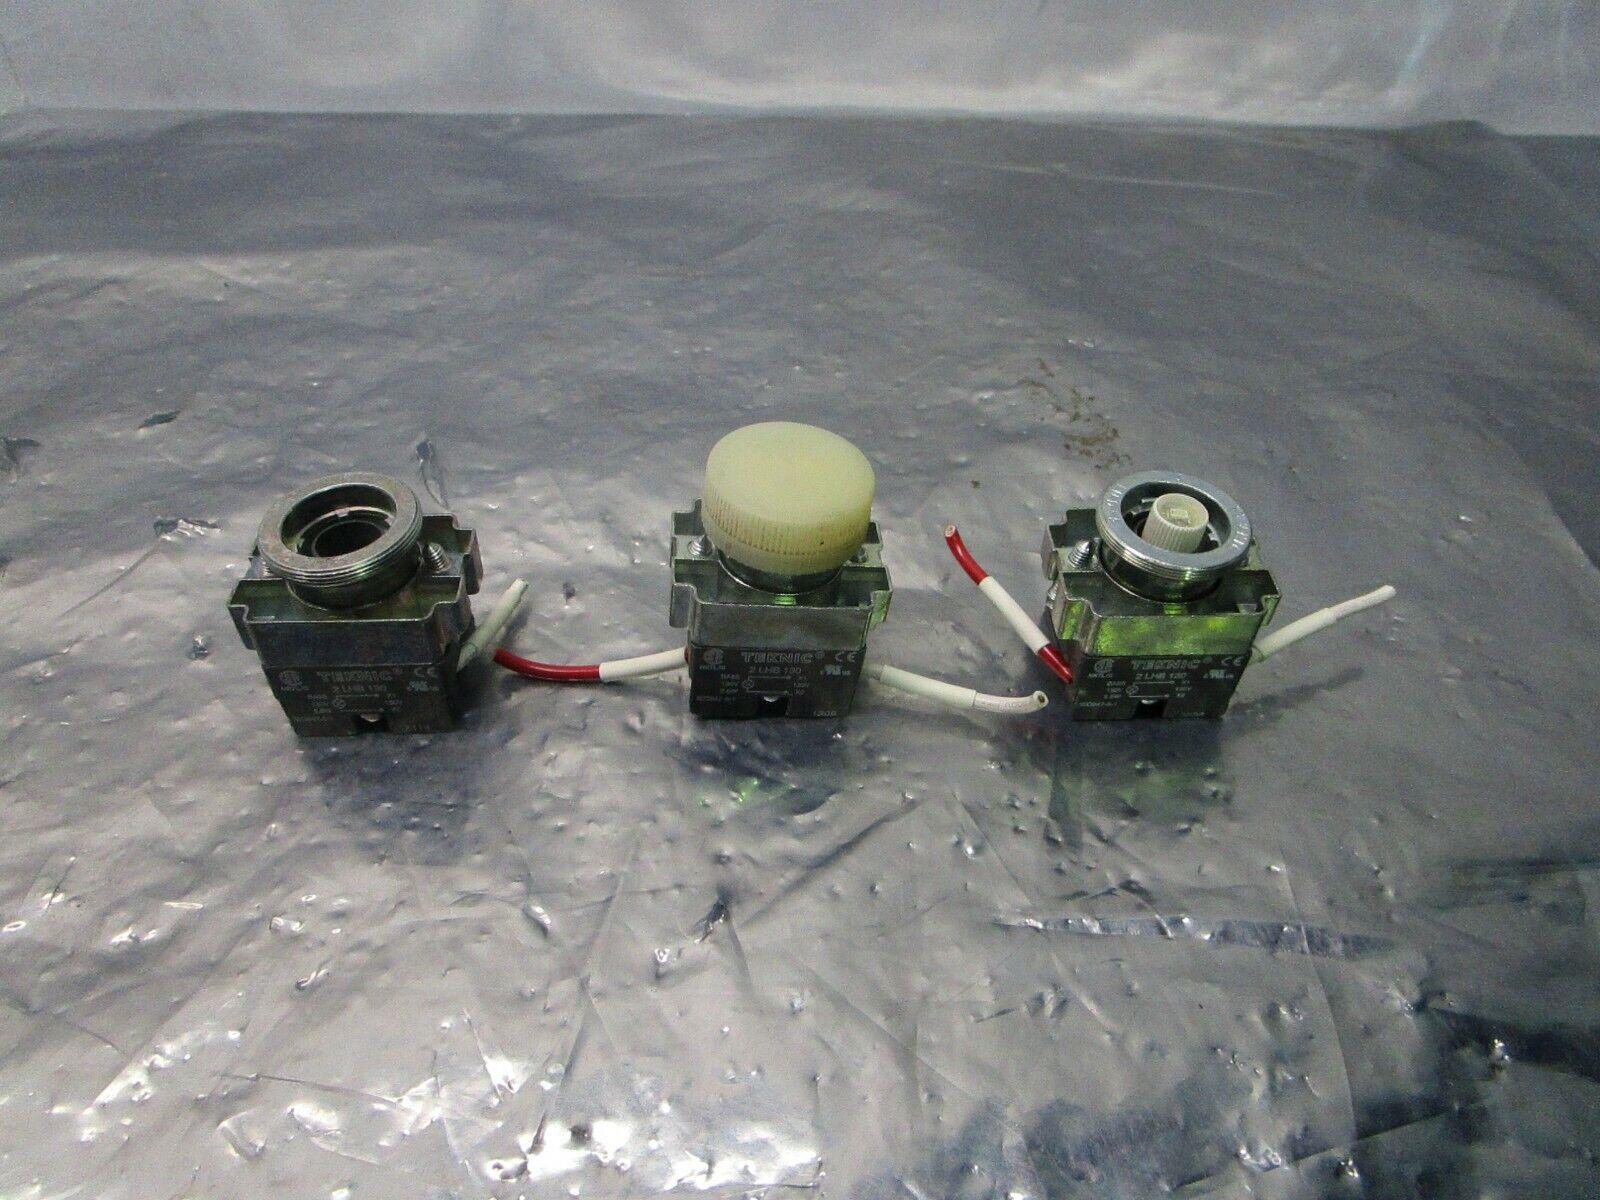 3 Teknic 2LHB130 Pushbutton, 101171